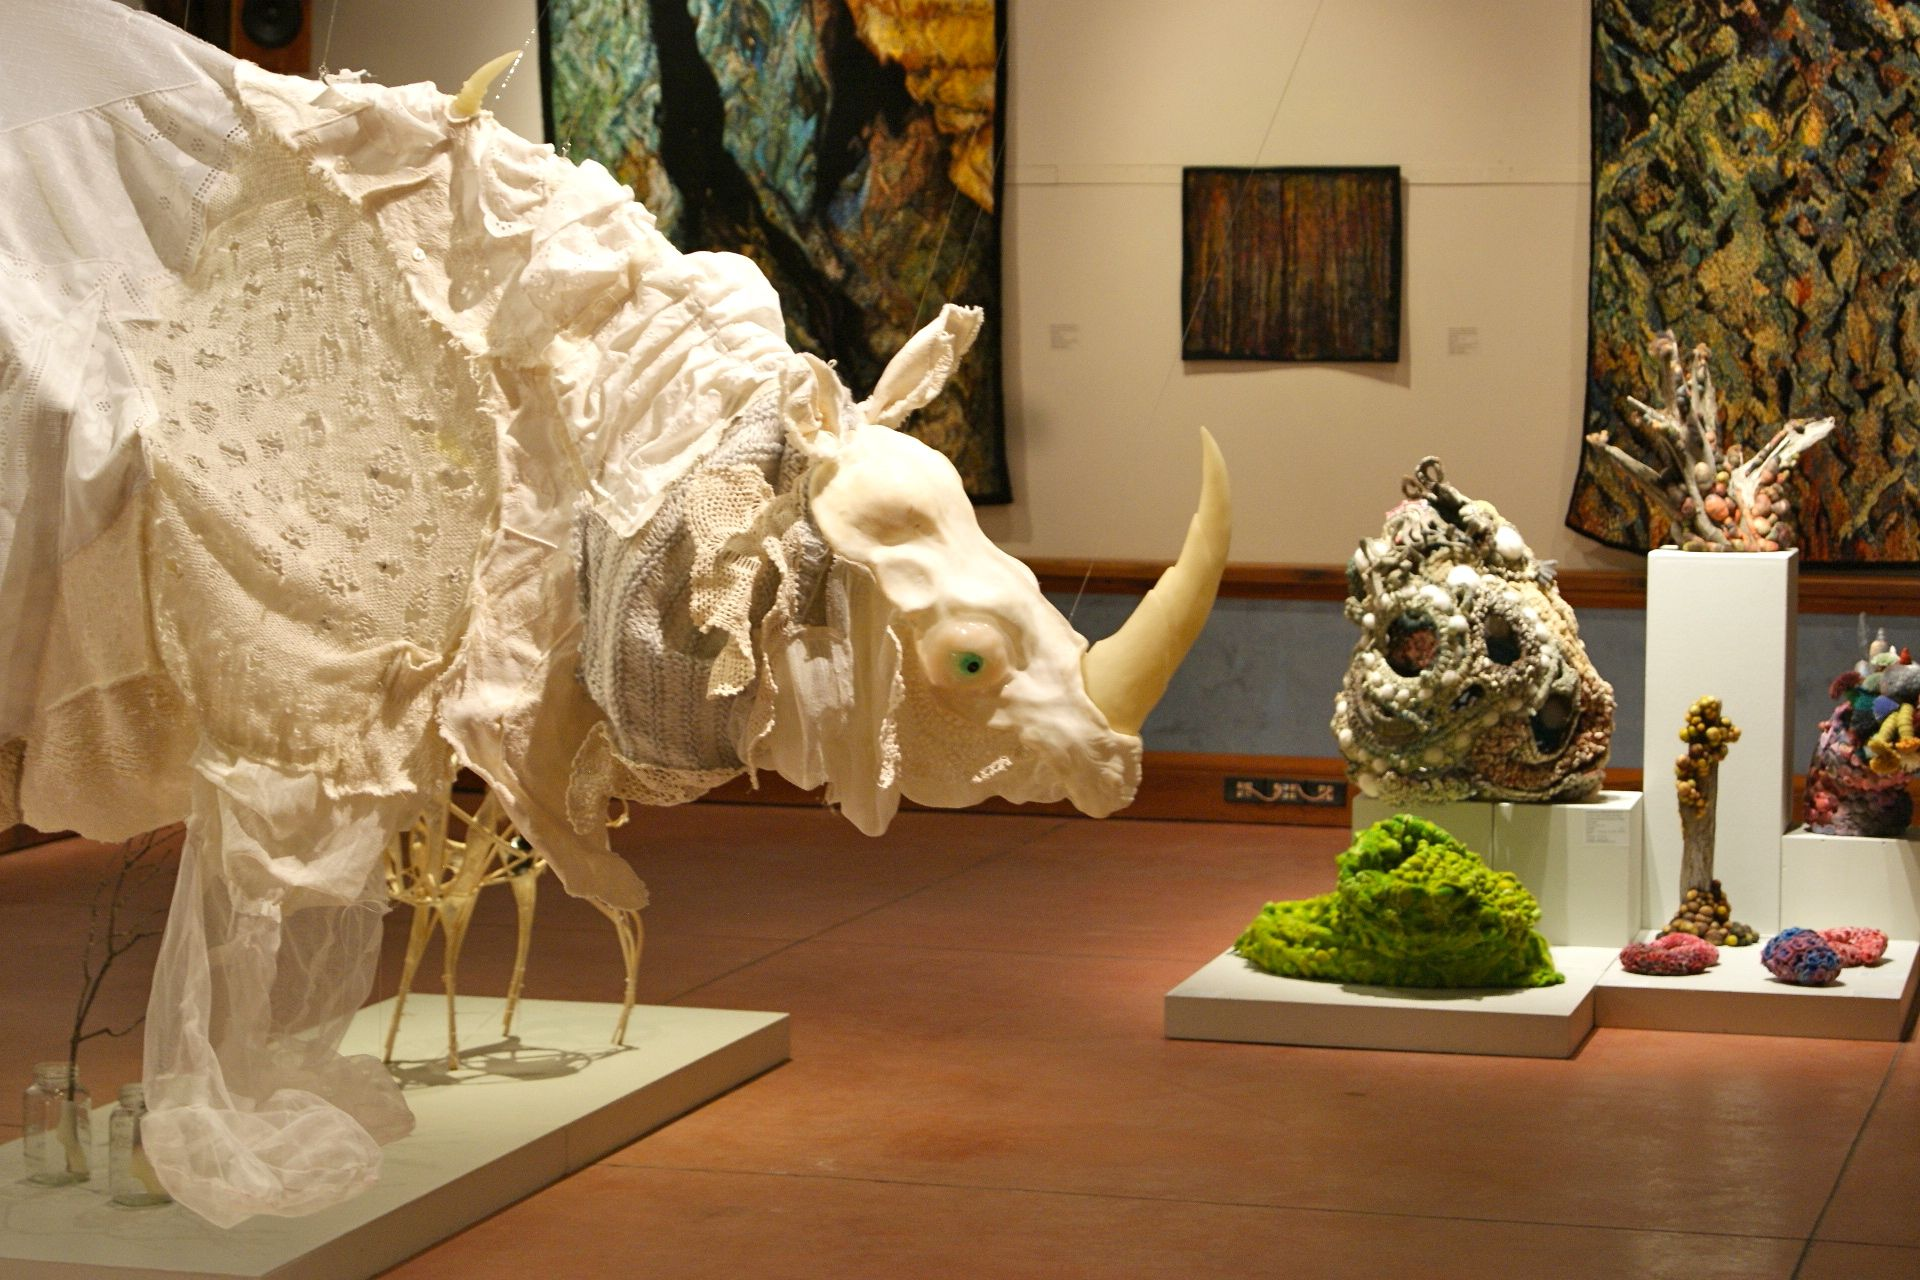 "#Art: #WOTFestival - Installation view ""De rerum natura"" exhibition of fibre art, World of Threads Festival. Photo: G Bate"